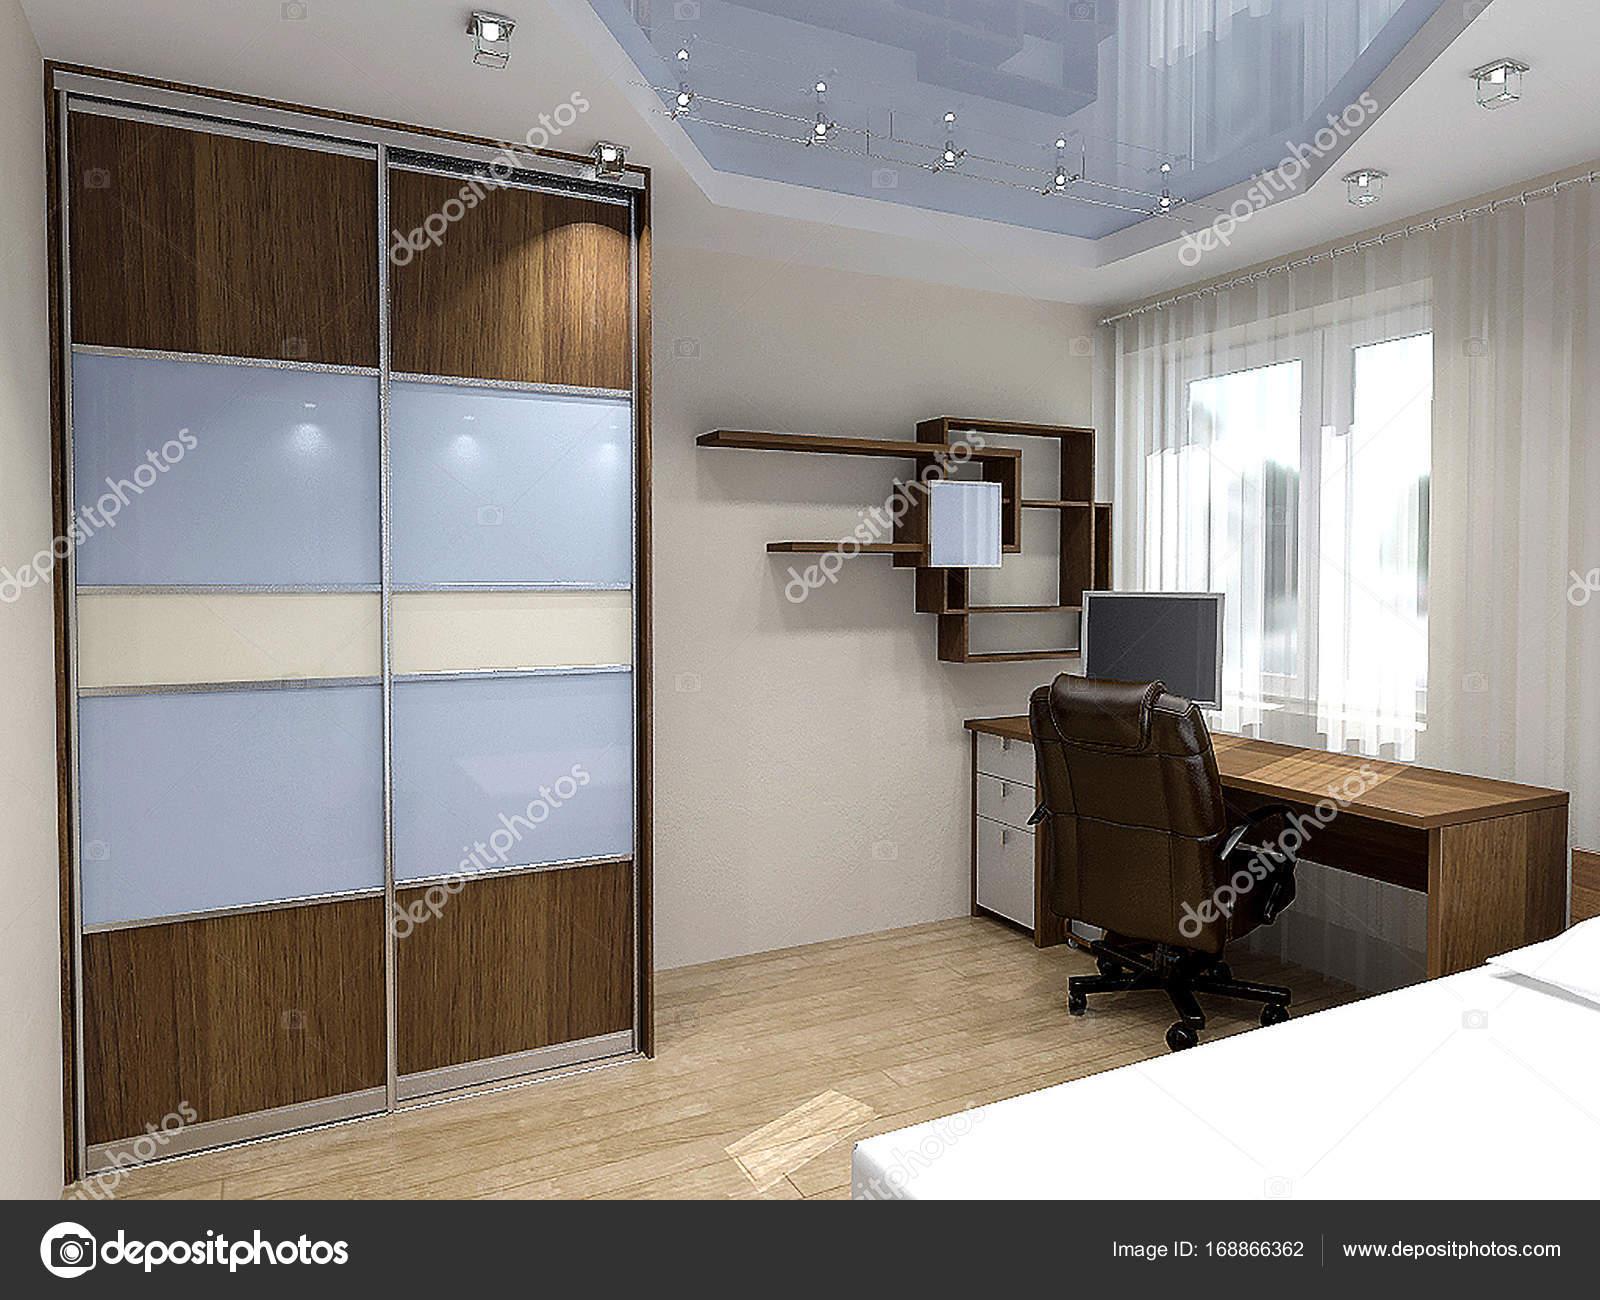 https://st3.depositphotos.com/5376352/16886/i/1600/depositphotos_168866362-stockafbeelding-slaapkamer-hedendaagse-styling-3d-illustratie.jpg